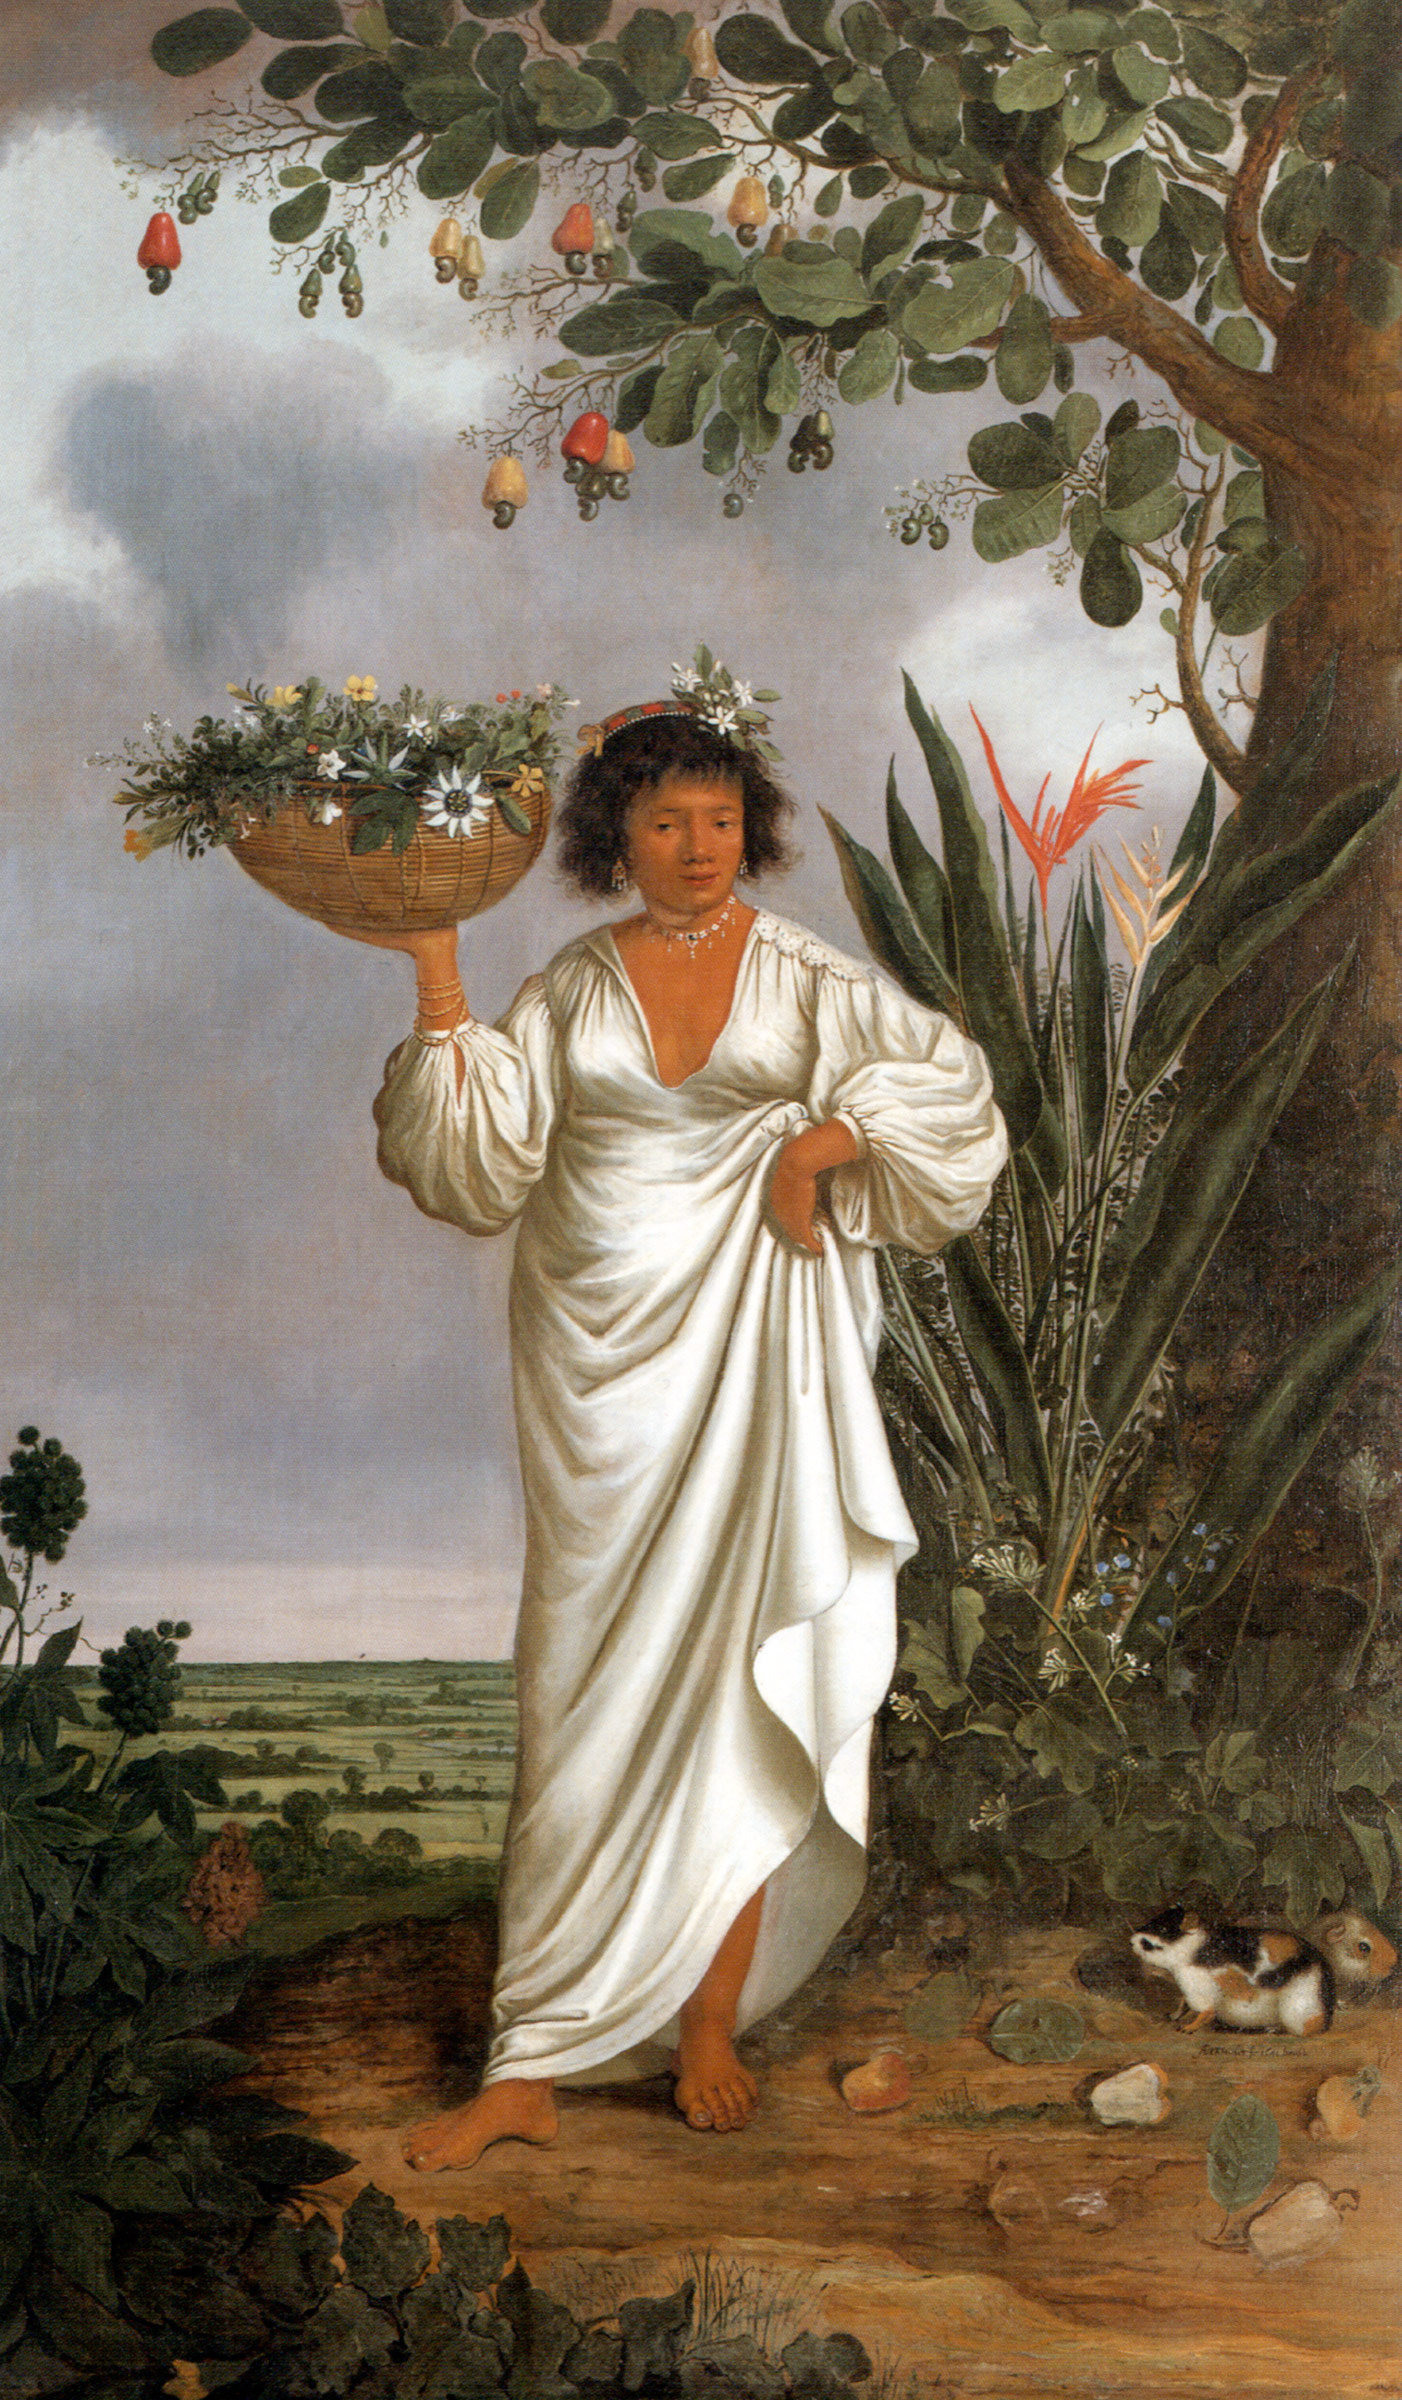 Albert Eckhout, Mameluca Woman